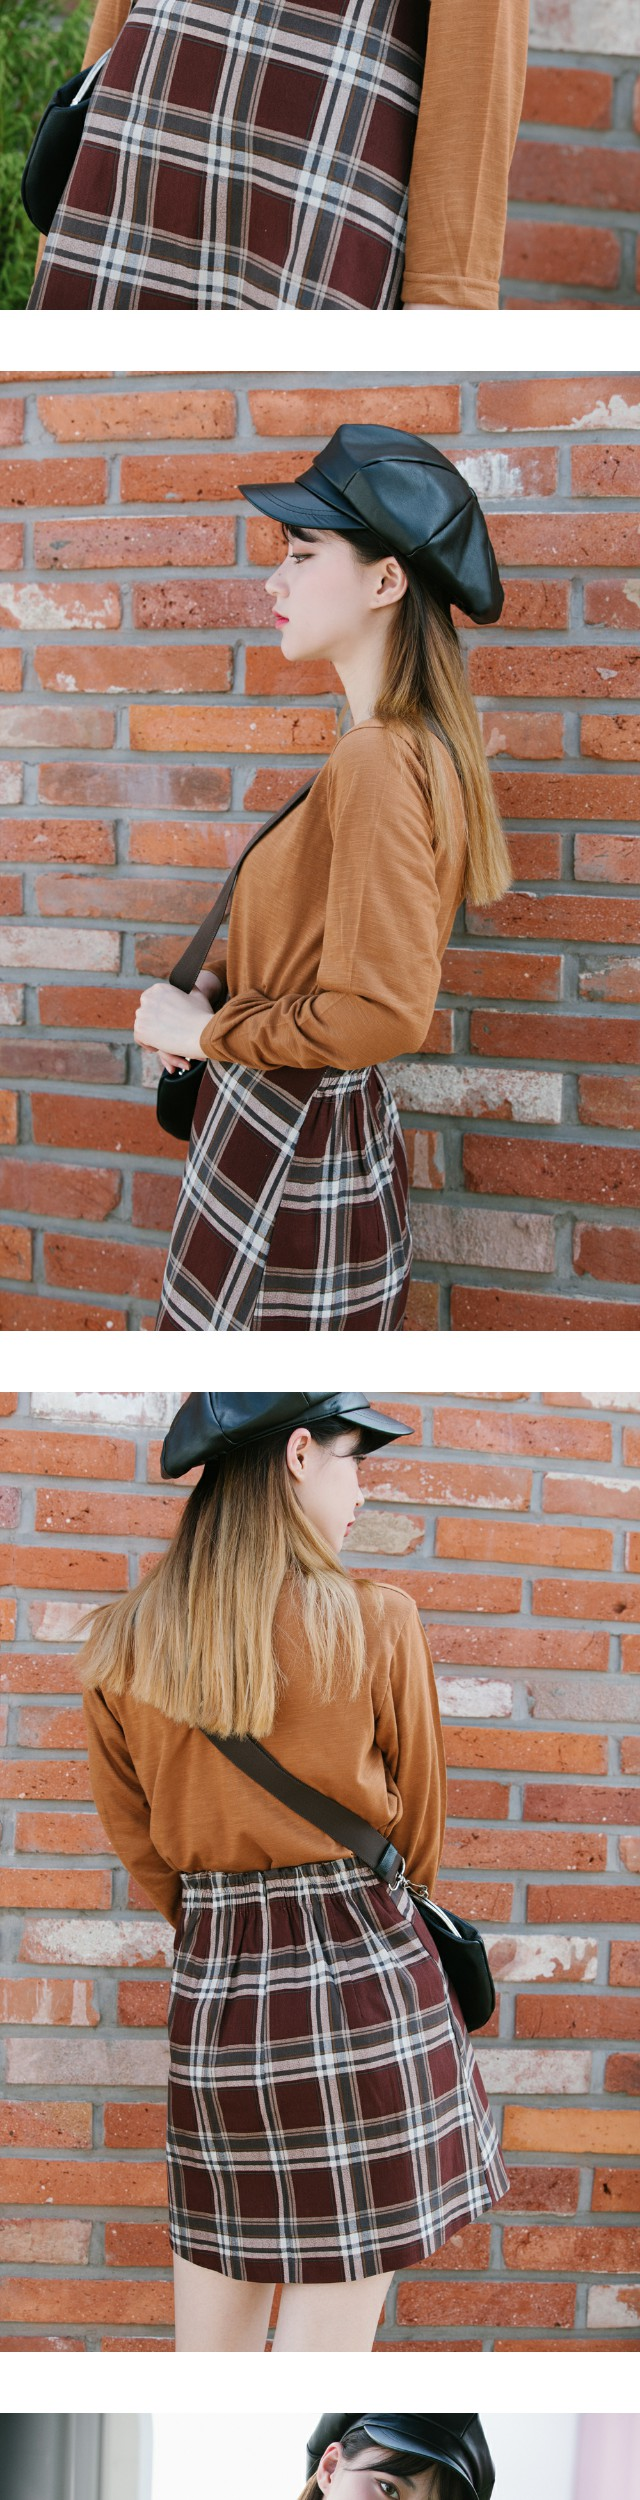 Cheek check skirt